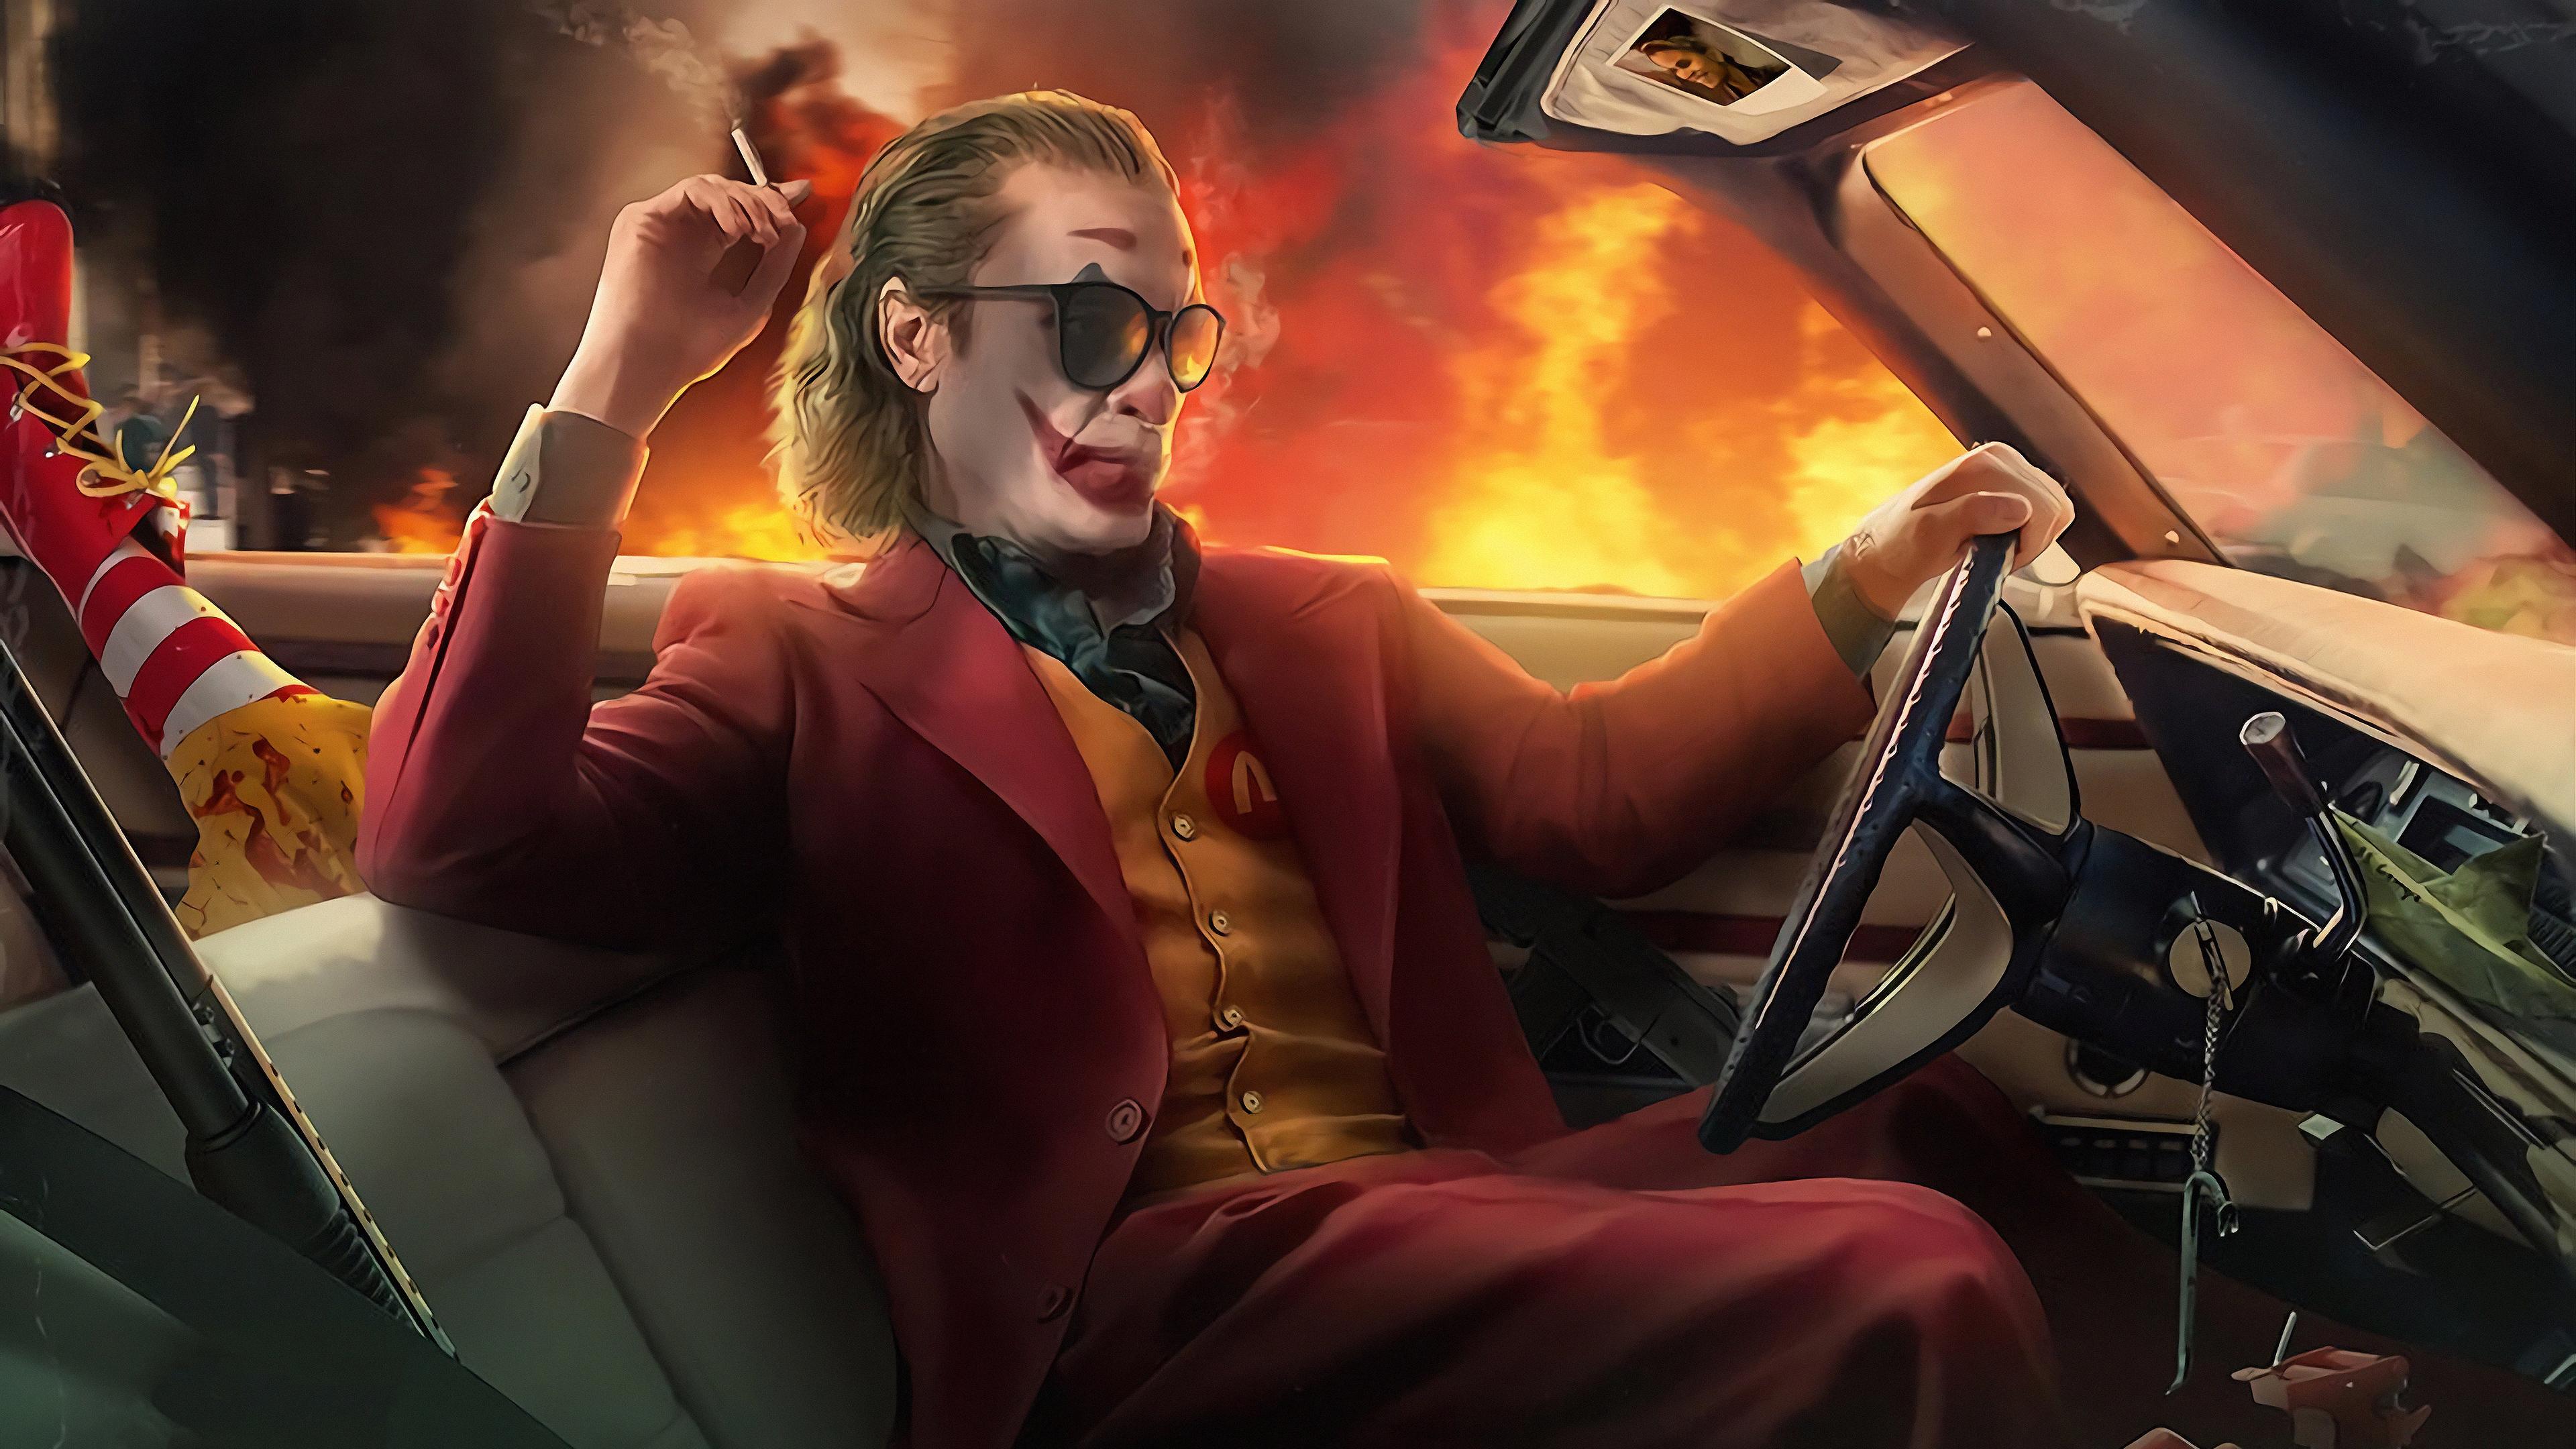 joker movie bosslogic art 1570394825 - Joker Movie Bosslogic Art - movies wallpapers, joker wallpapers, joker movie wallpapers, joaquin phoenix wallpapers, hd-wallpapers, 4k-wallpapers, 2019 movies wallpapers